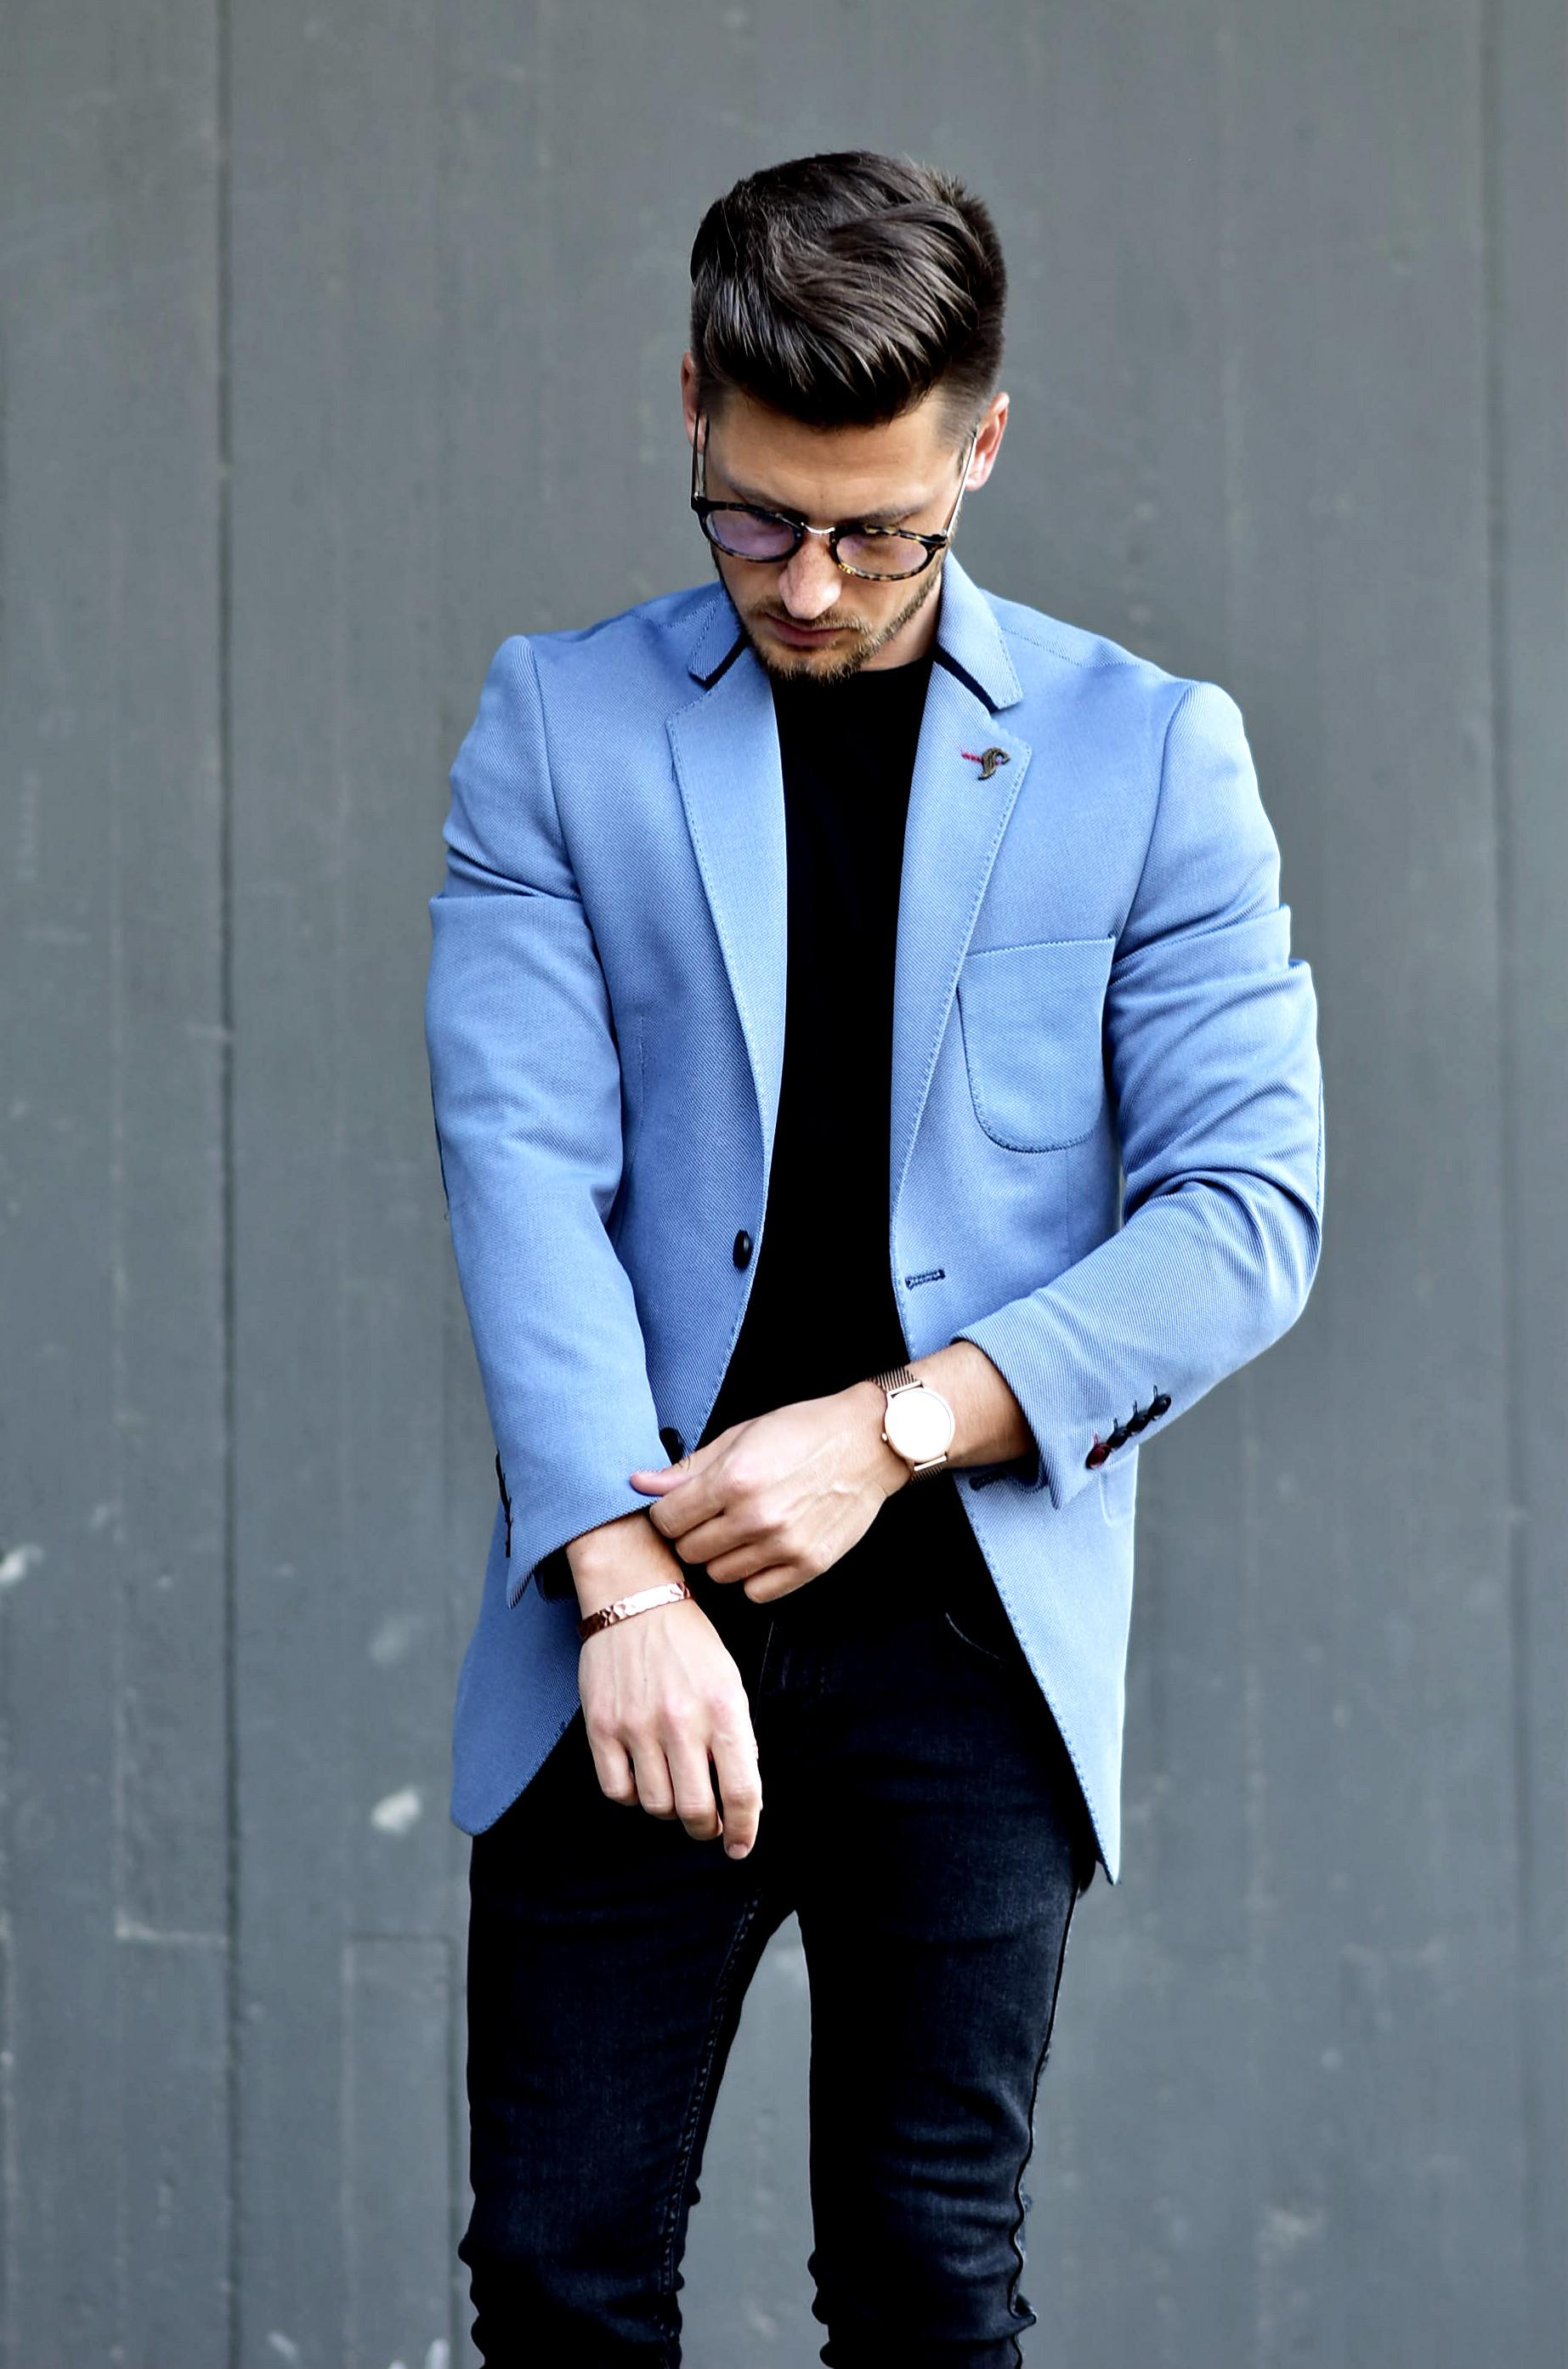 Tommeezjerry-Styleblog-Männerblog-Männer-Modeblog-Berlin-Berlinblog-Outfit-Streetlook-Royalblauer-Blazer-Royalblue-All-Black-Look-Chelsea-Boots-Skinny-Jeans-9